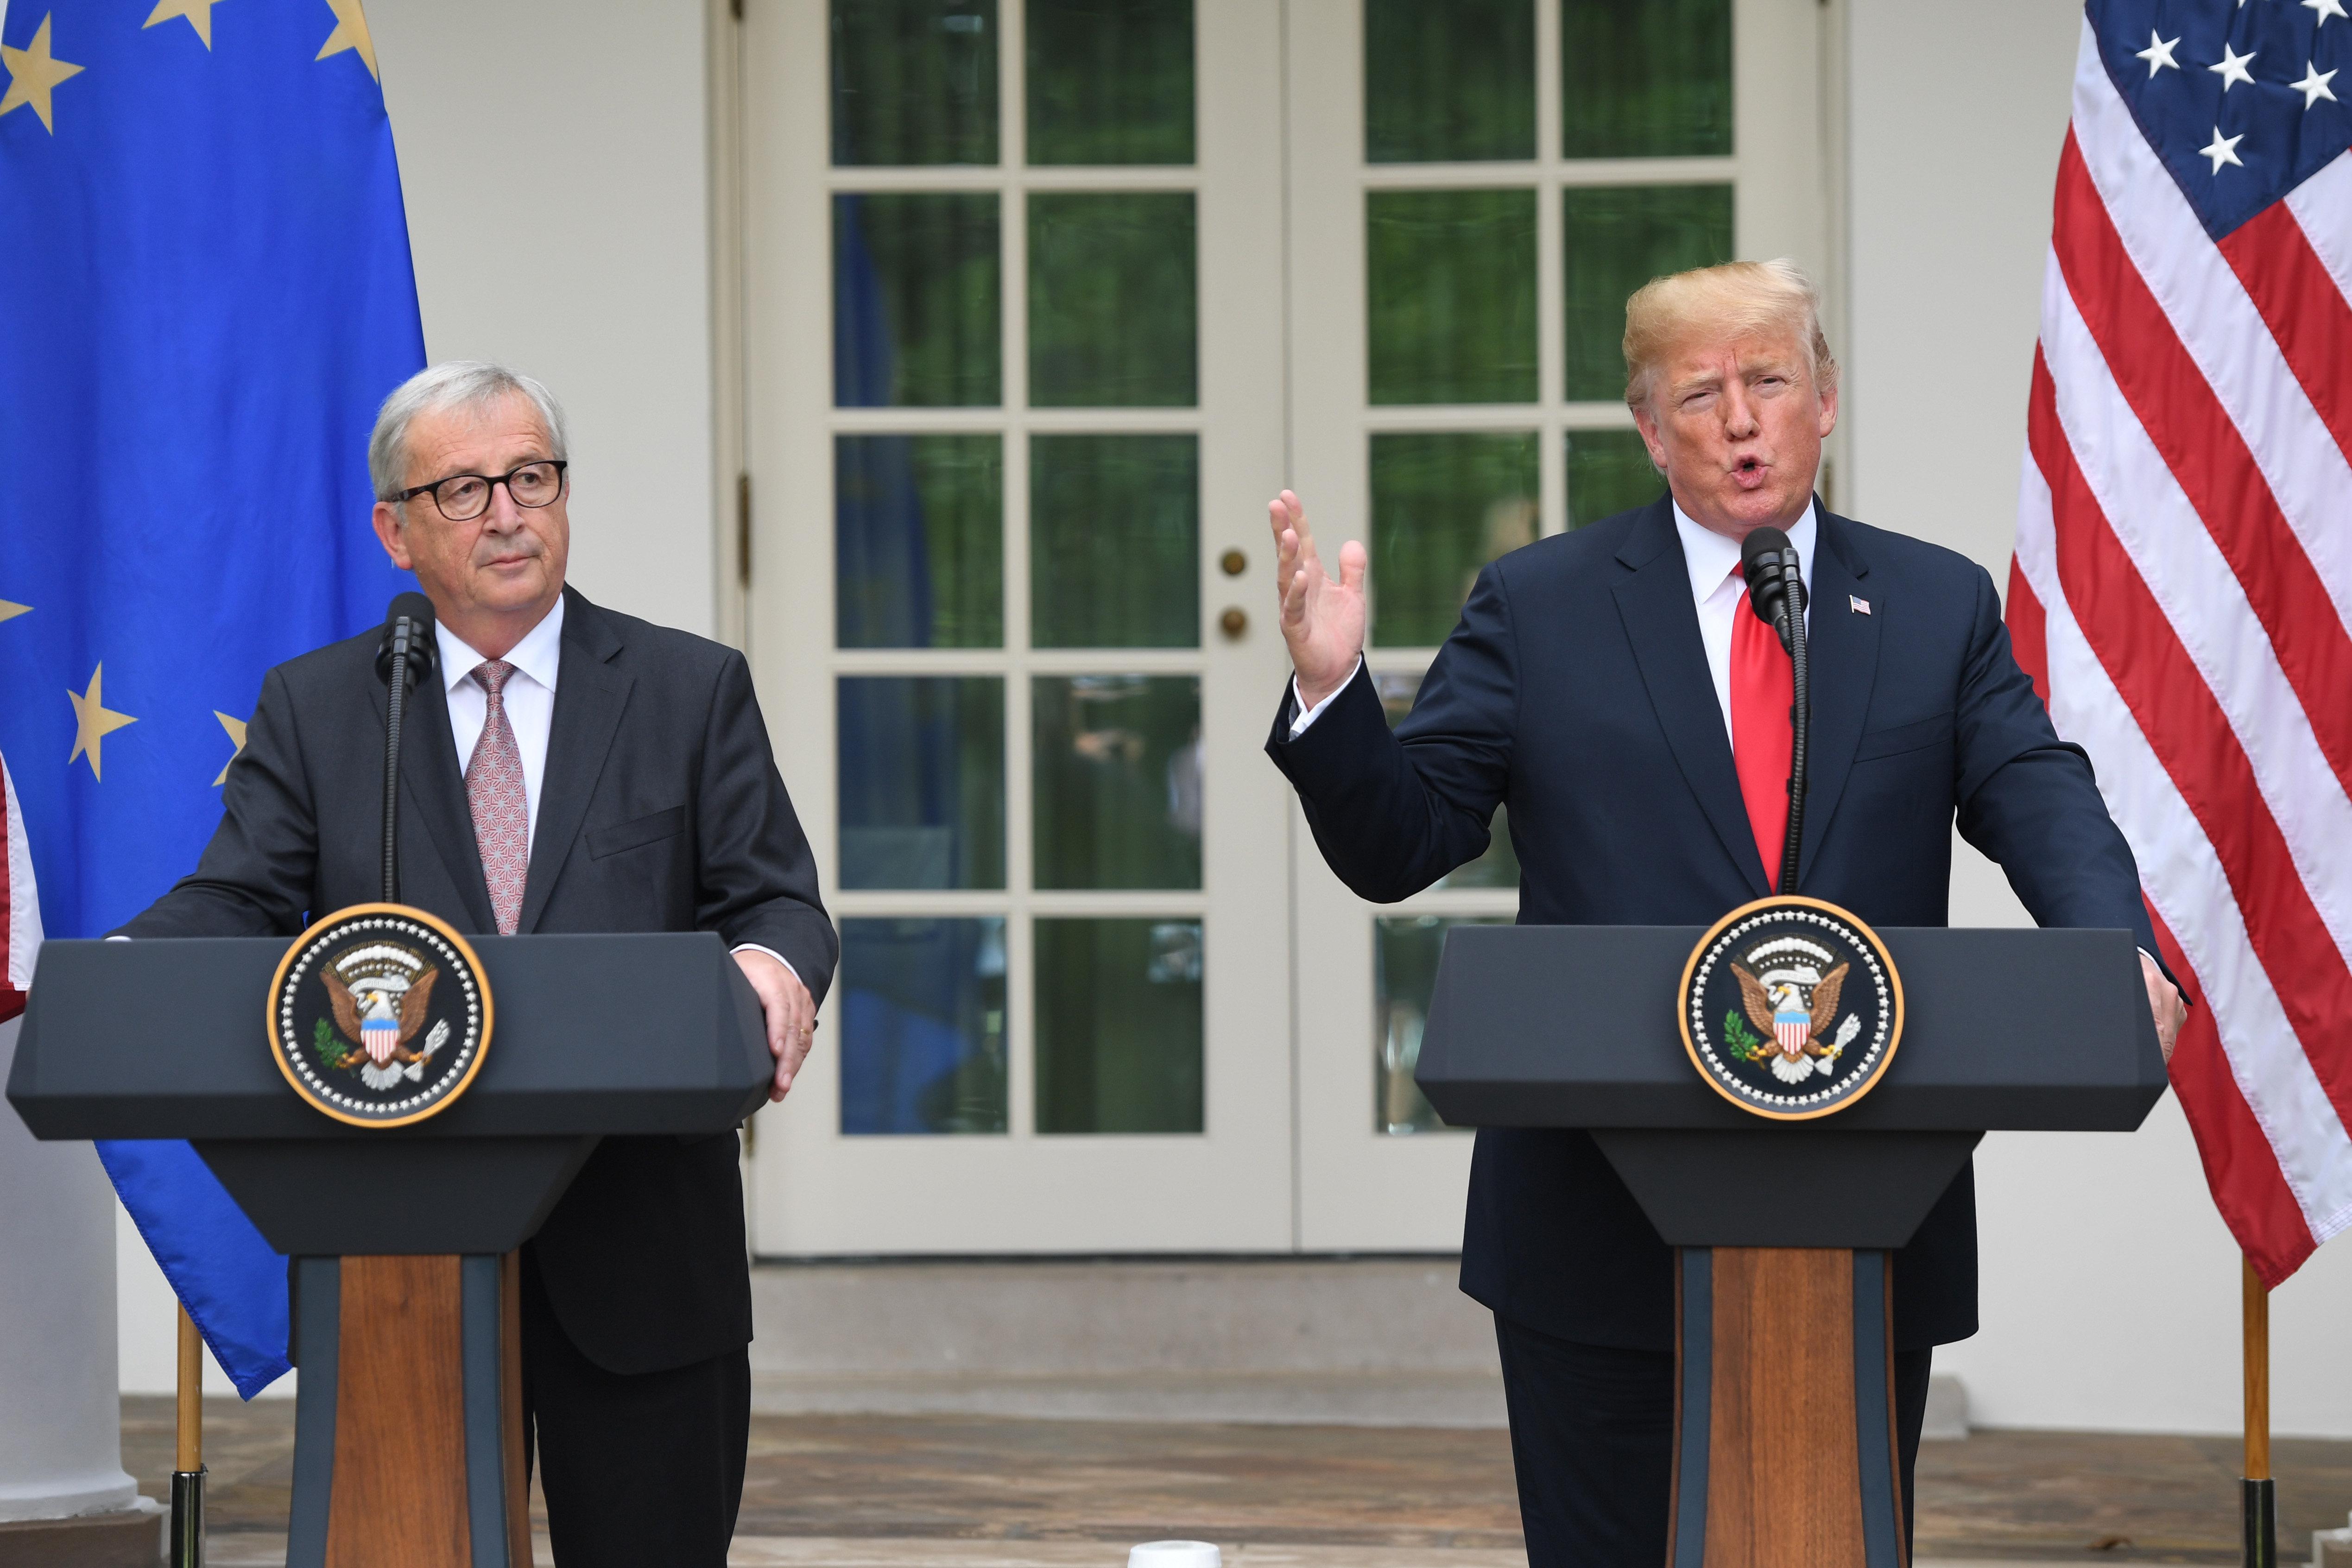 Donald Trump Says US And EU Will Work Towards 'Zero Tariffs'